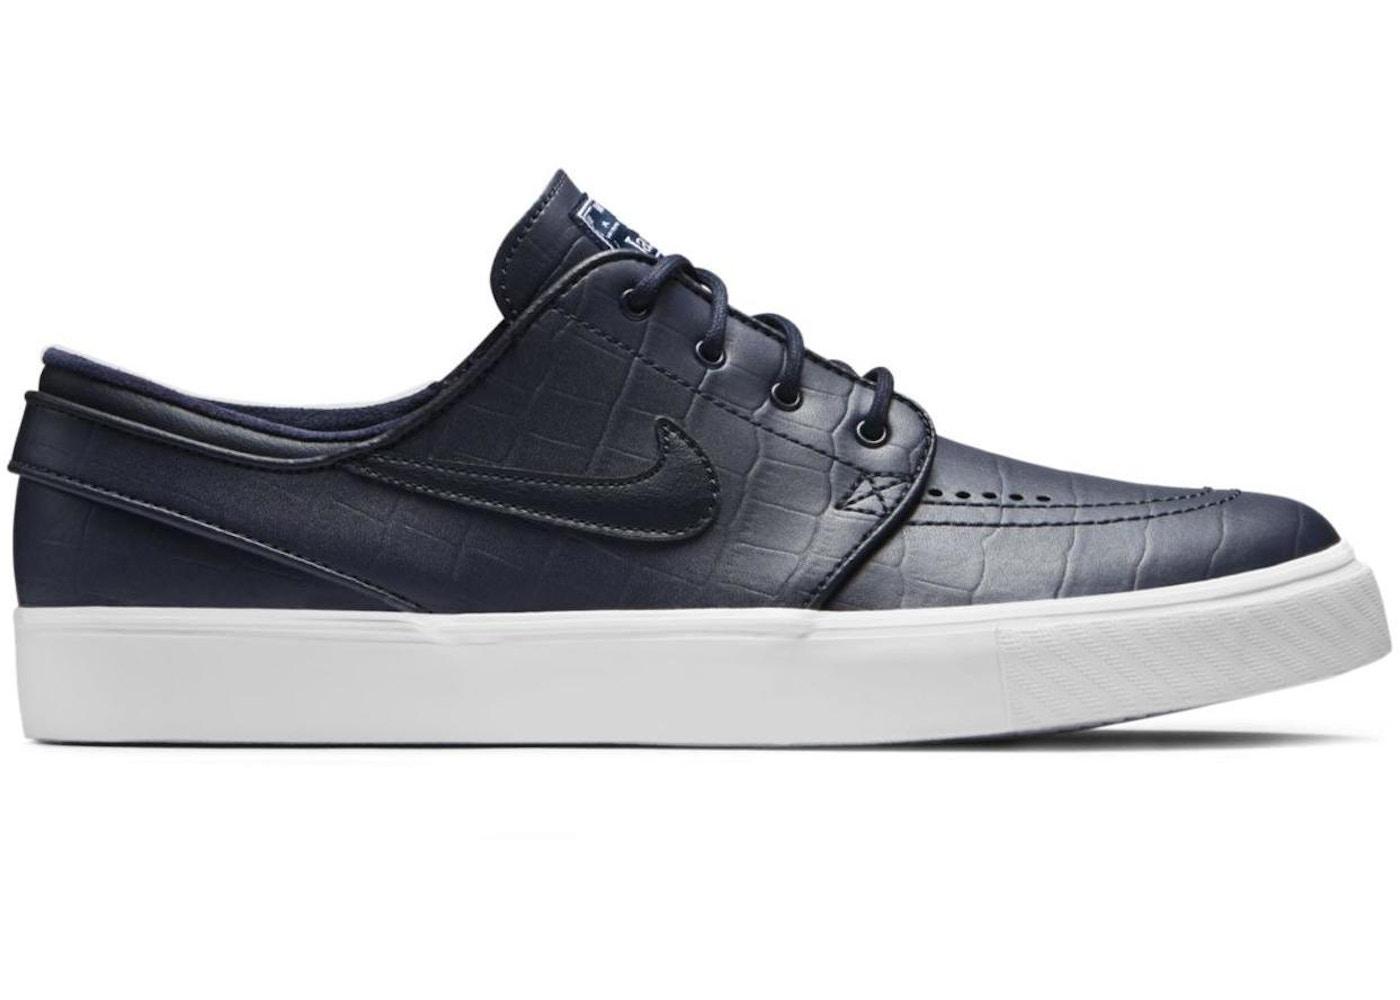 95bec316 Nike SB Stefan Janoski Zoom Blue Croc - 708417-441